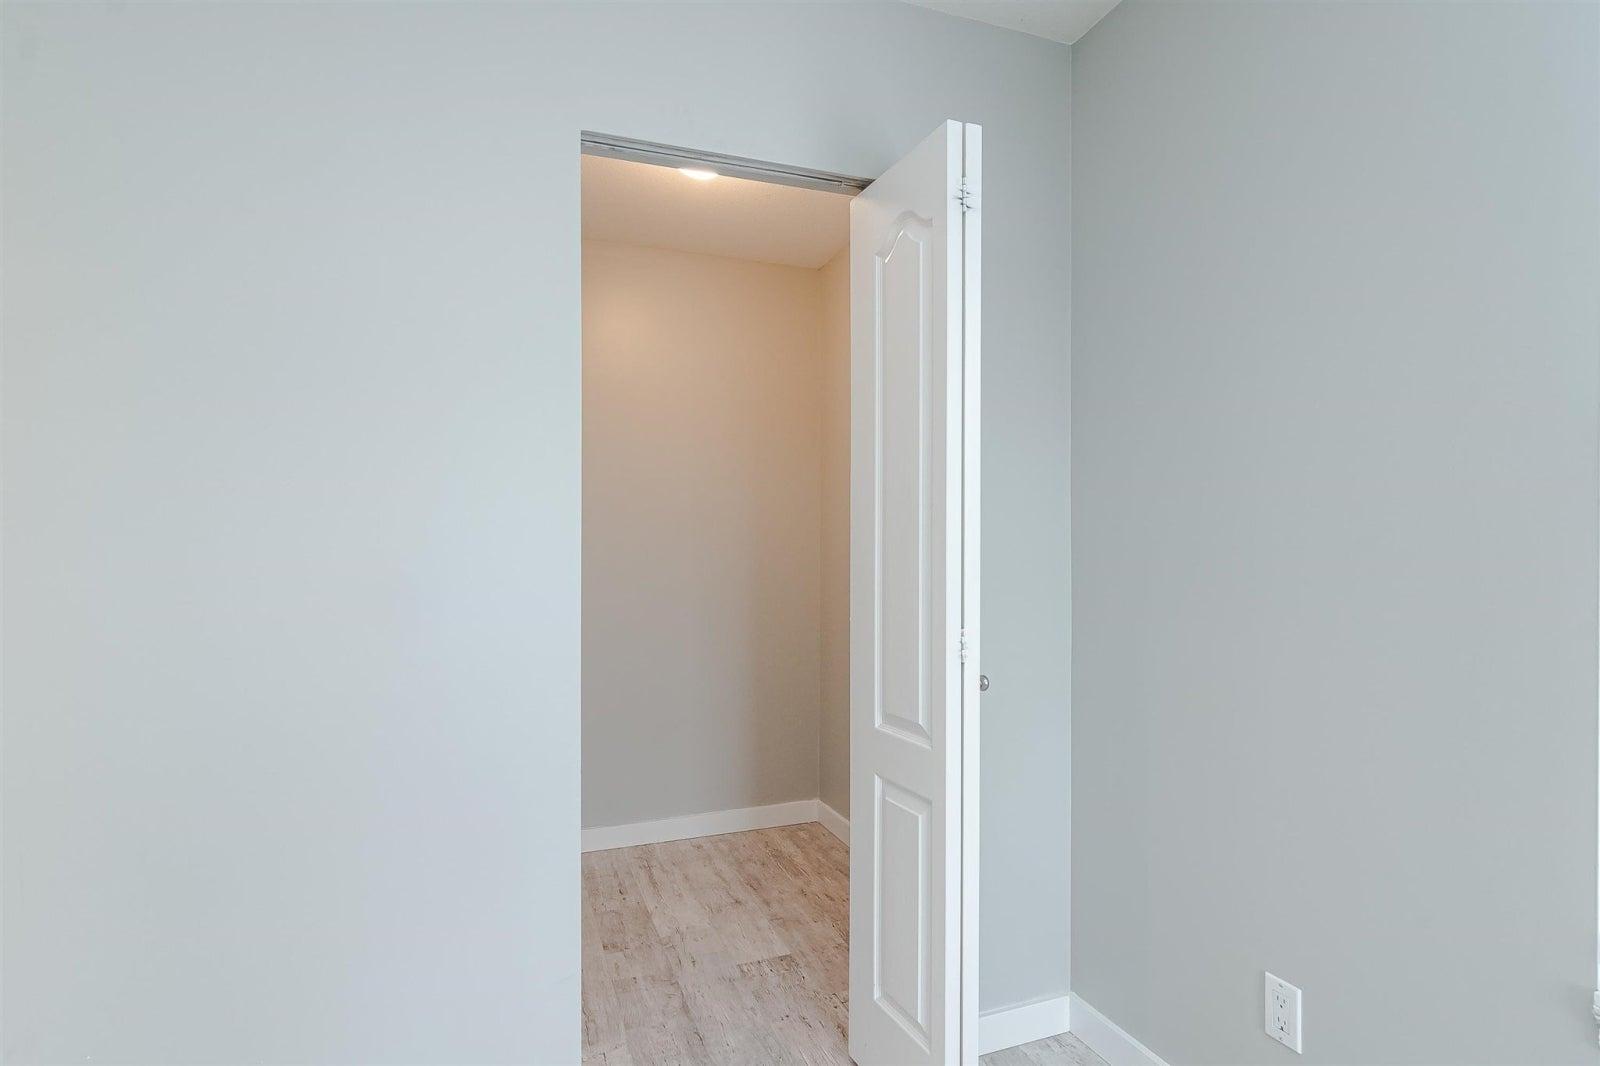 405 20268 54 AVENUE - Langley City Apartment/Condo for sale, 2 Bedrooms (R2604183) #17